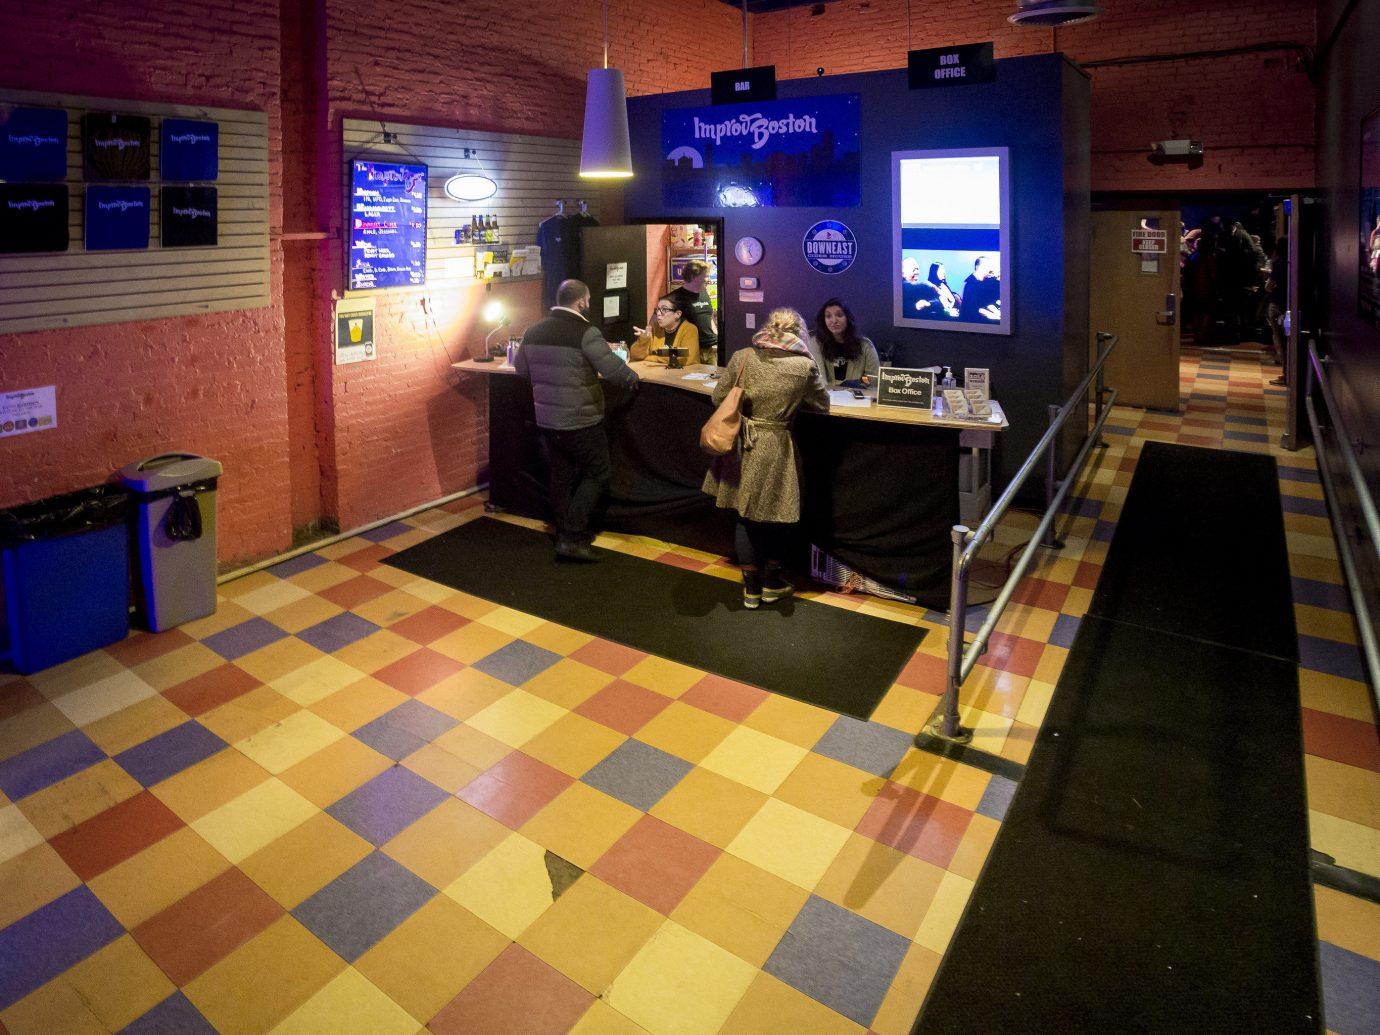 Trip Ideas floor indoor recreation room room ceiling games interior design Design tiled